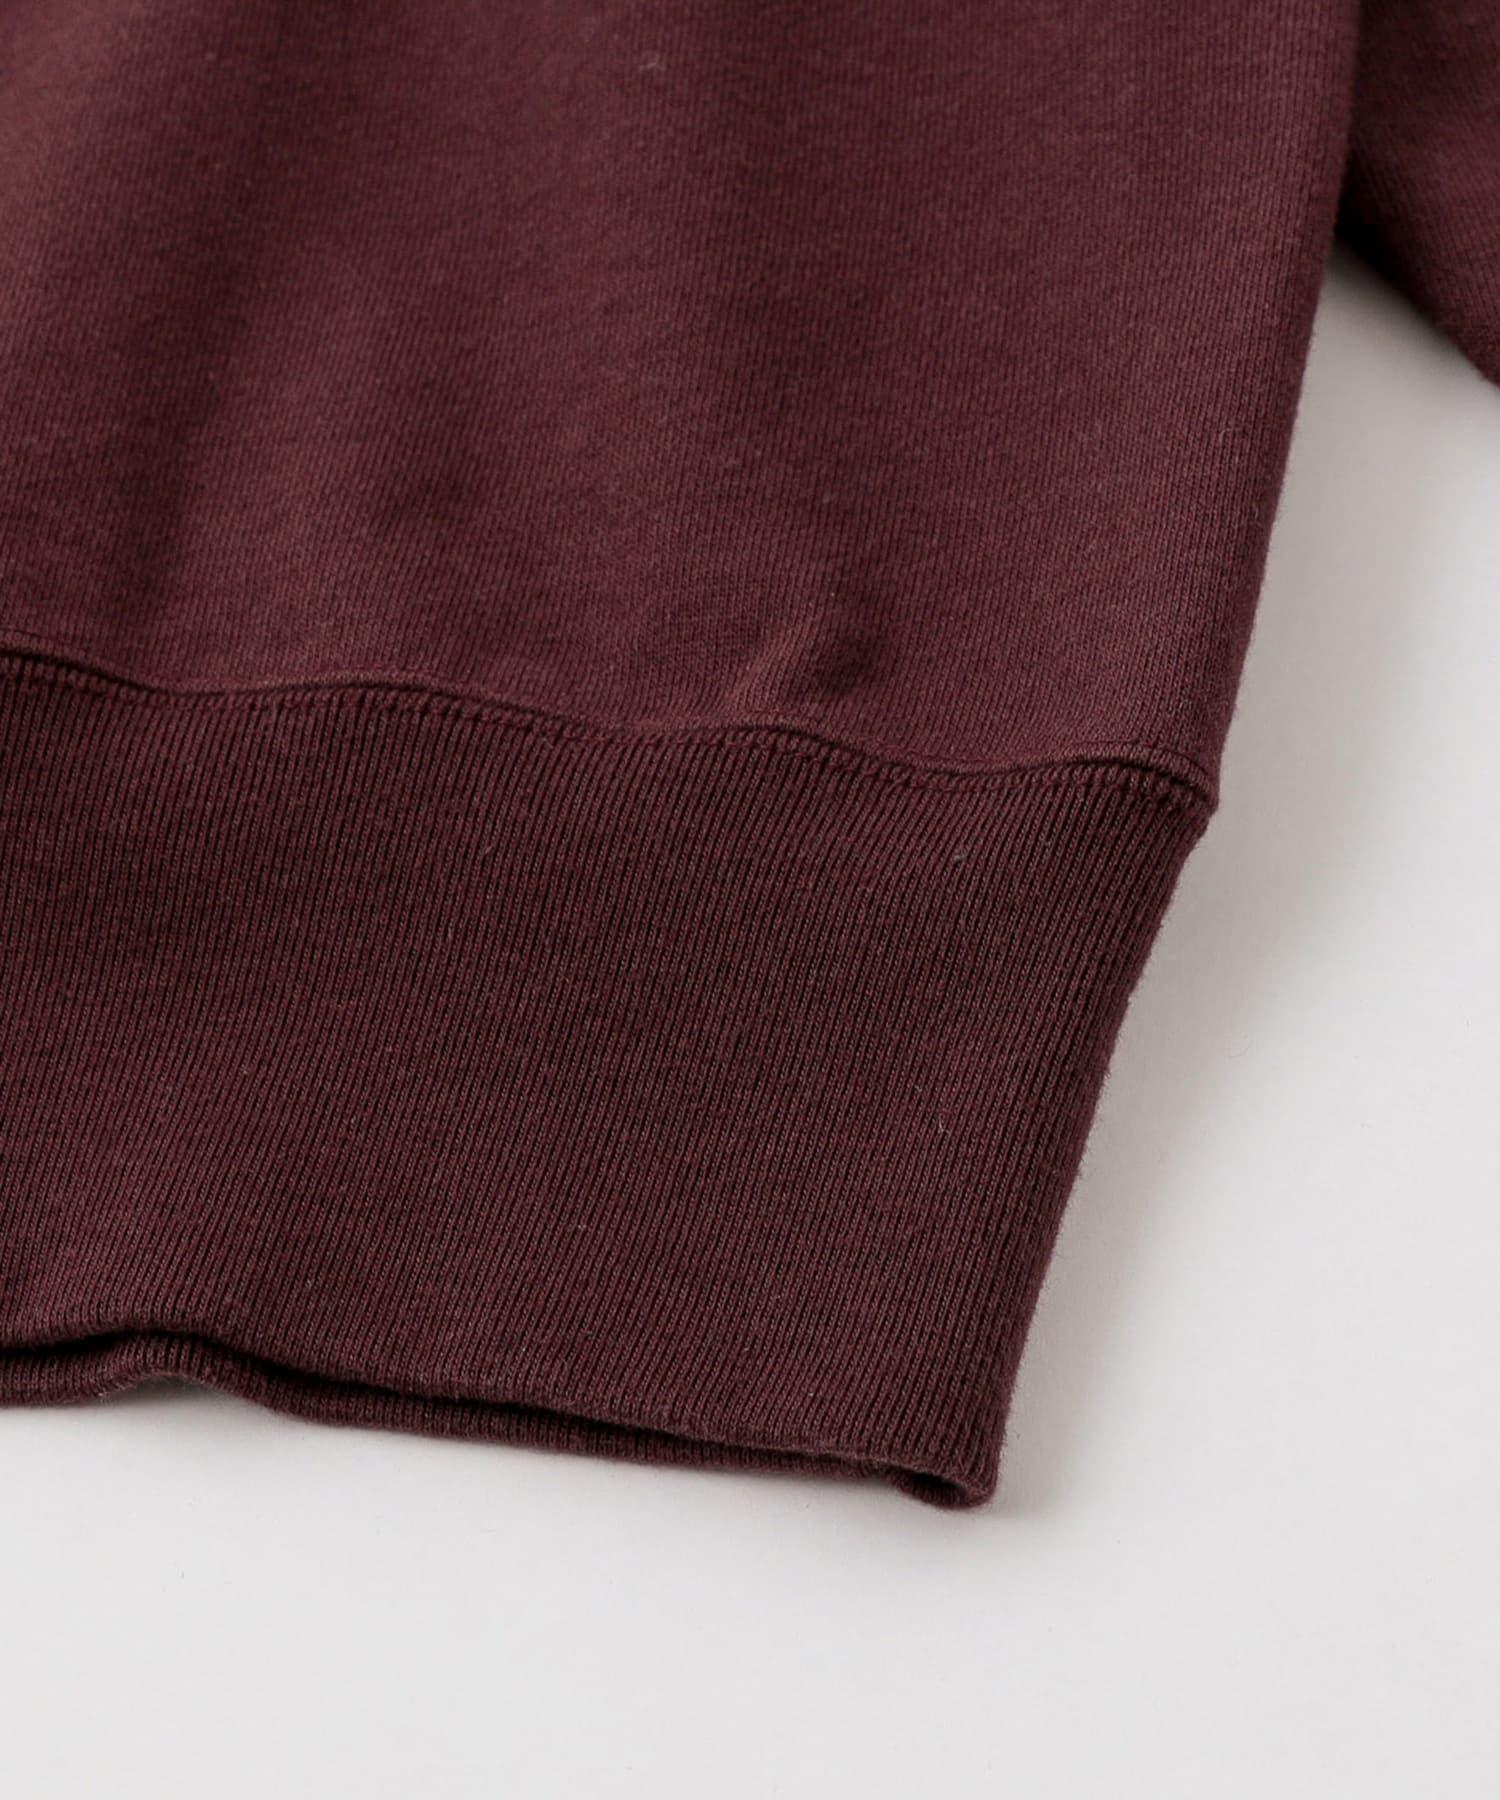 BLOOM&BRANCH(ブルームアンドブランチ) PHLANNÈL SOL / mens Suvin Cotton Sweat